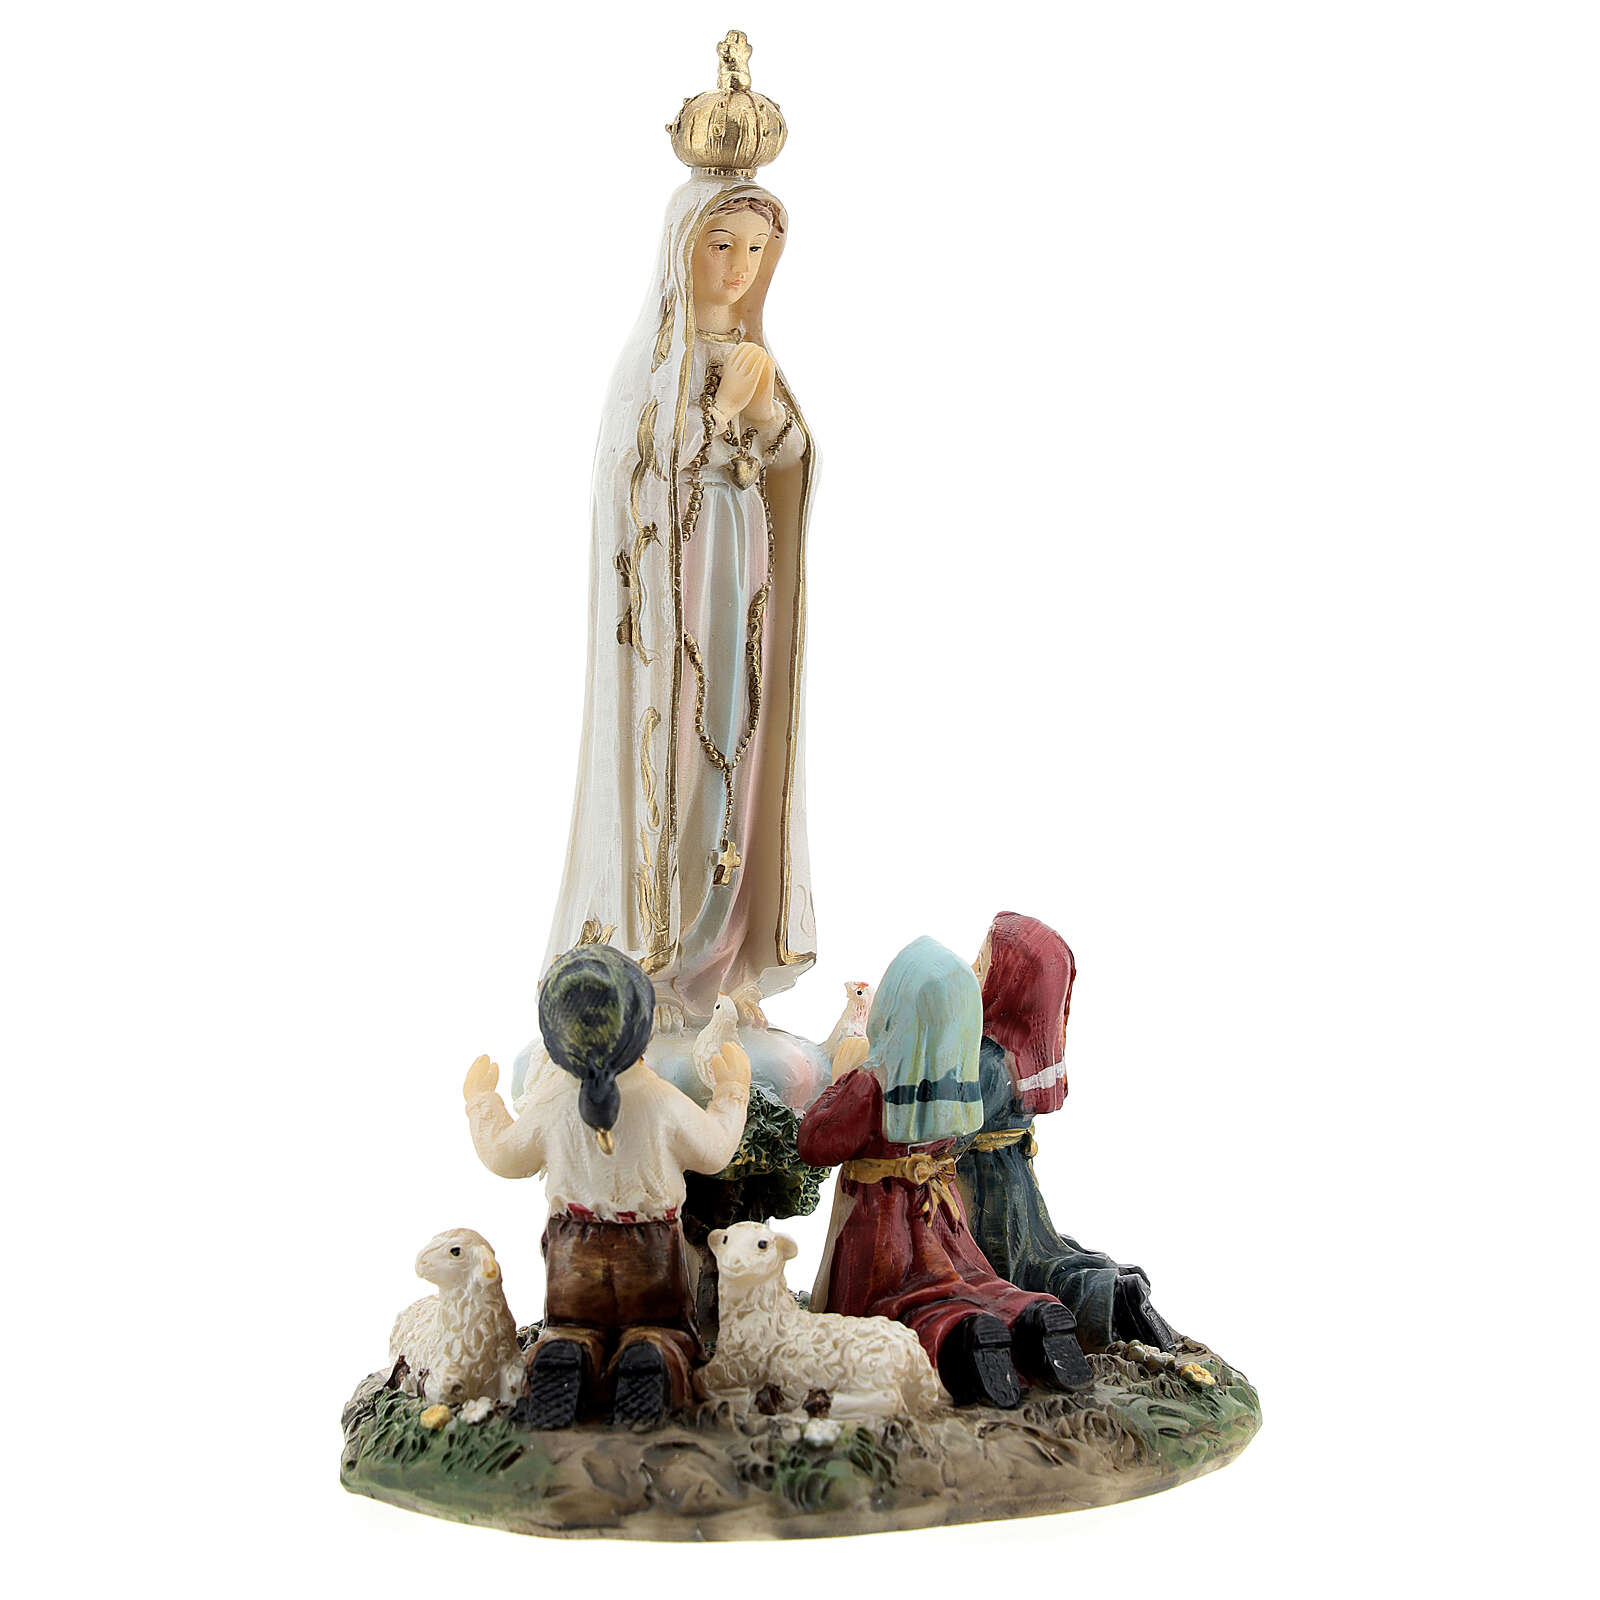 Madonna Fatima bambini agnelli statua resina 14 cm 4